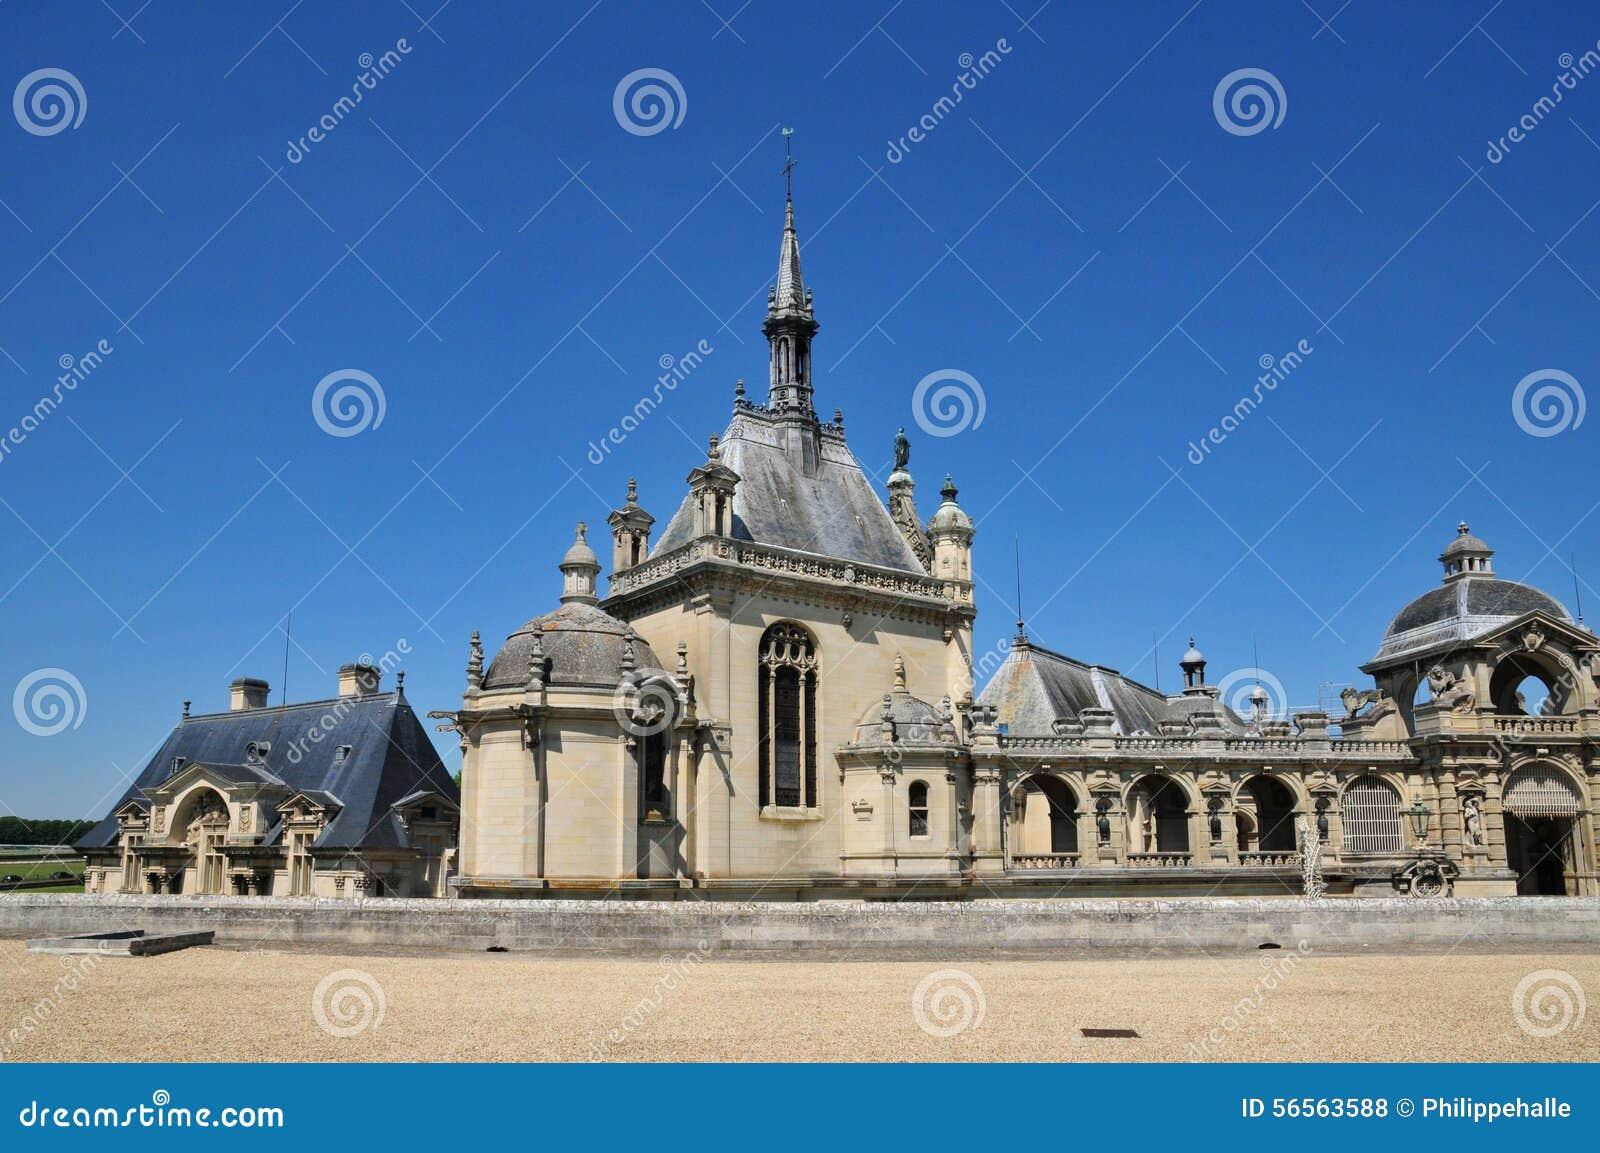 Download Picardie, το γραφικό κάστρο Chantilly Oise Στοκ Εικόνες - εικόνα από γαλλία, oise: 56563588